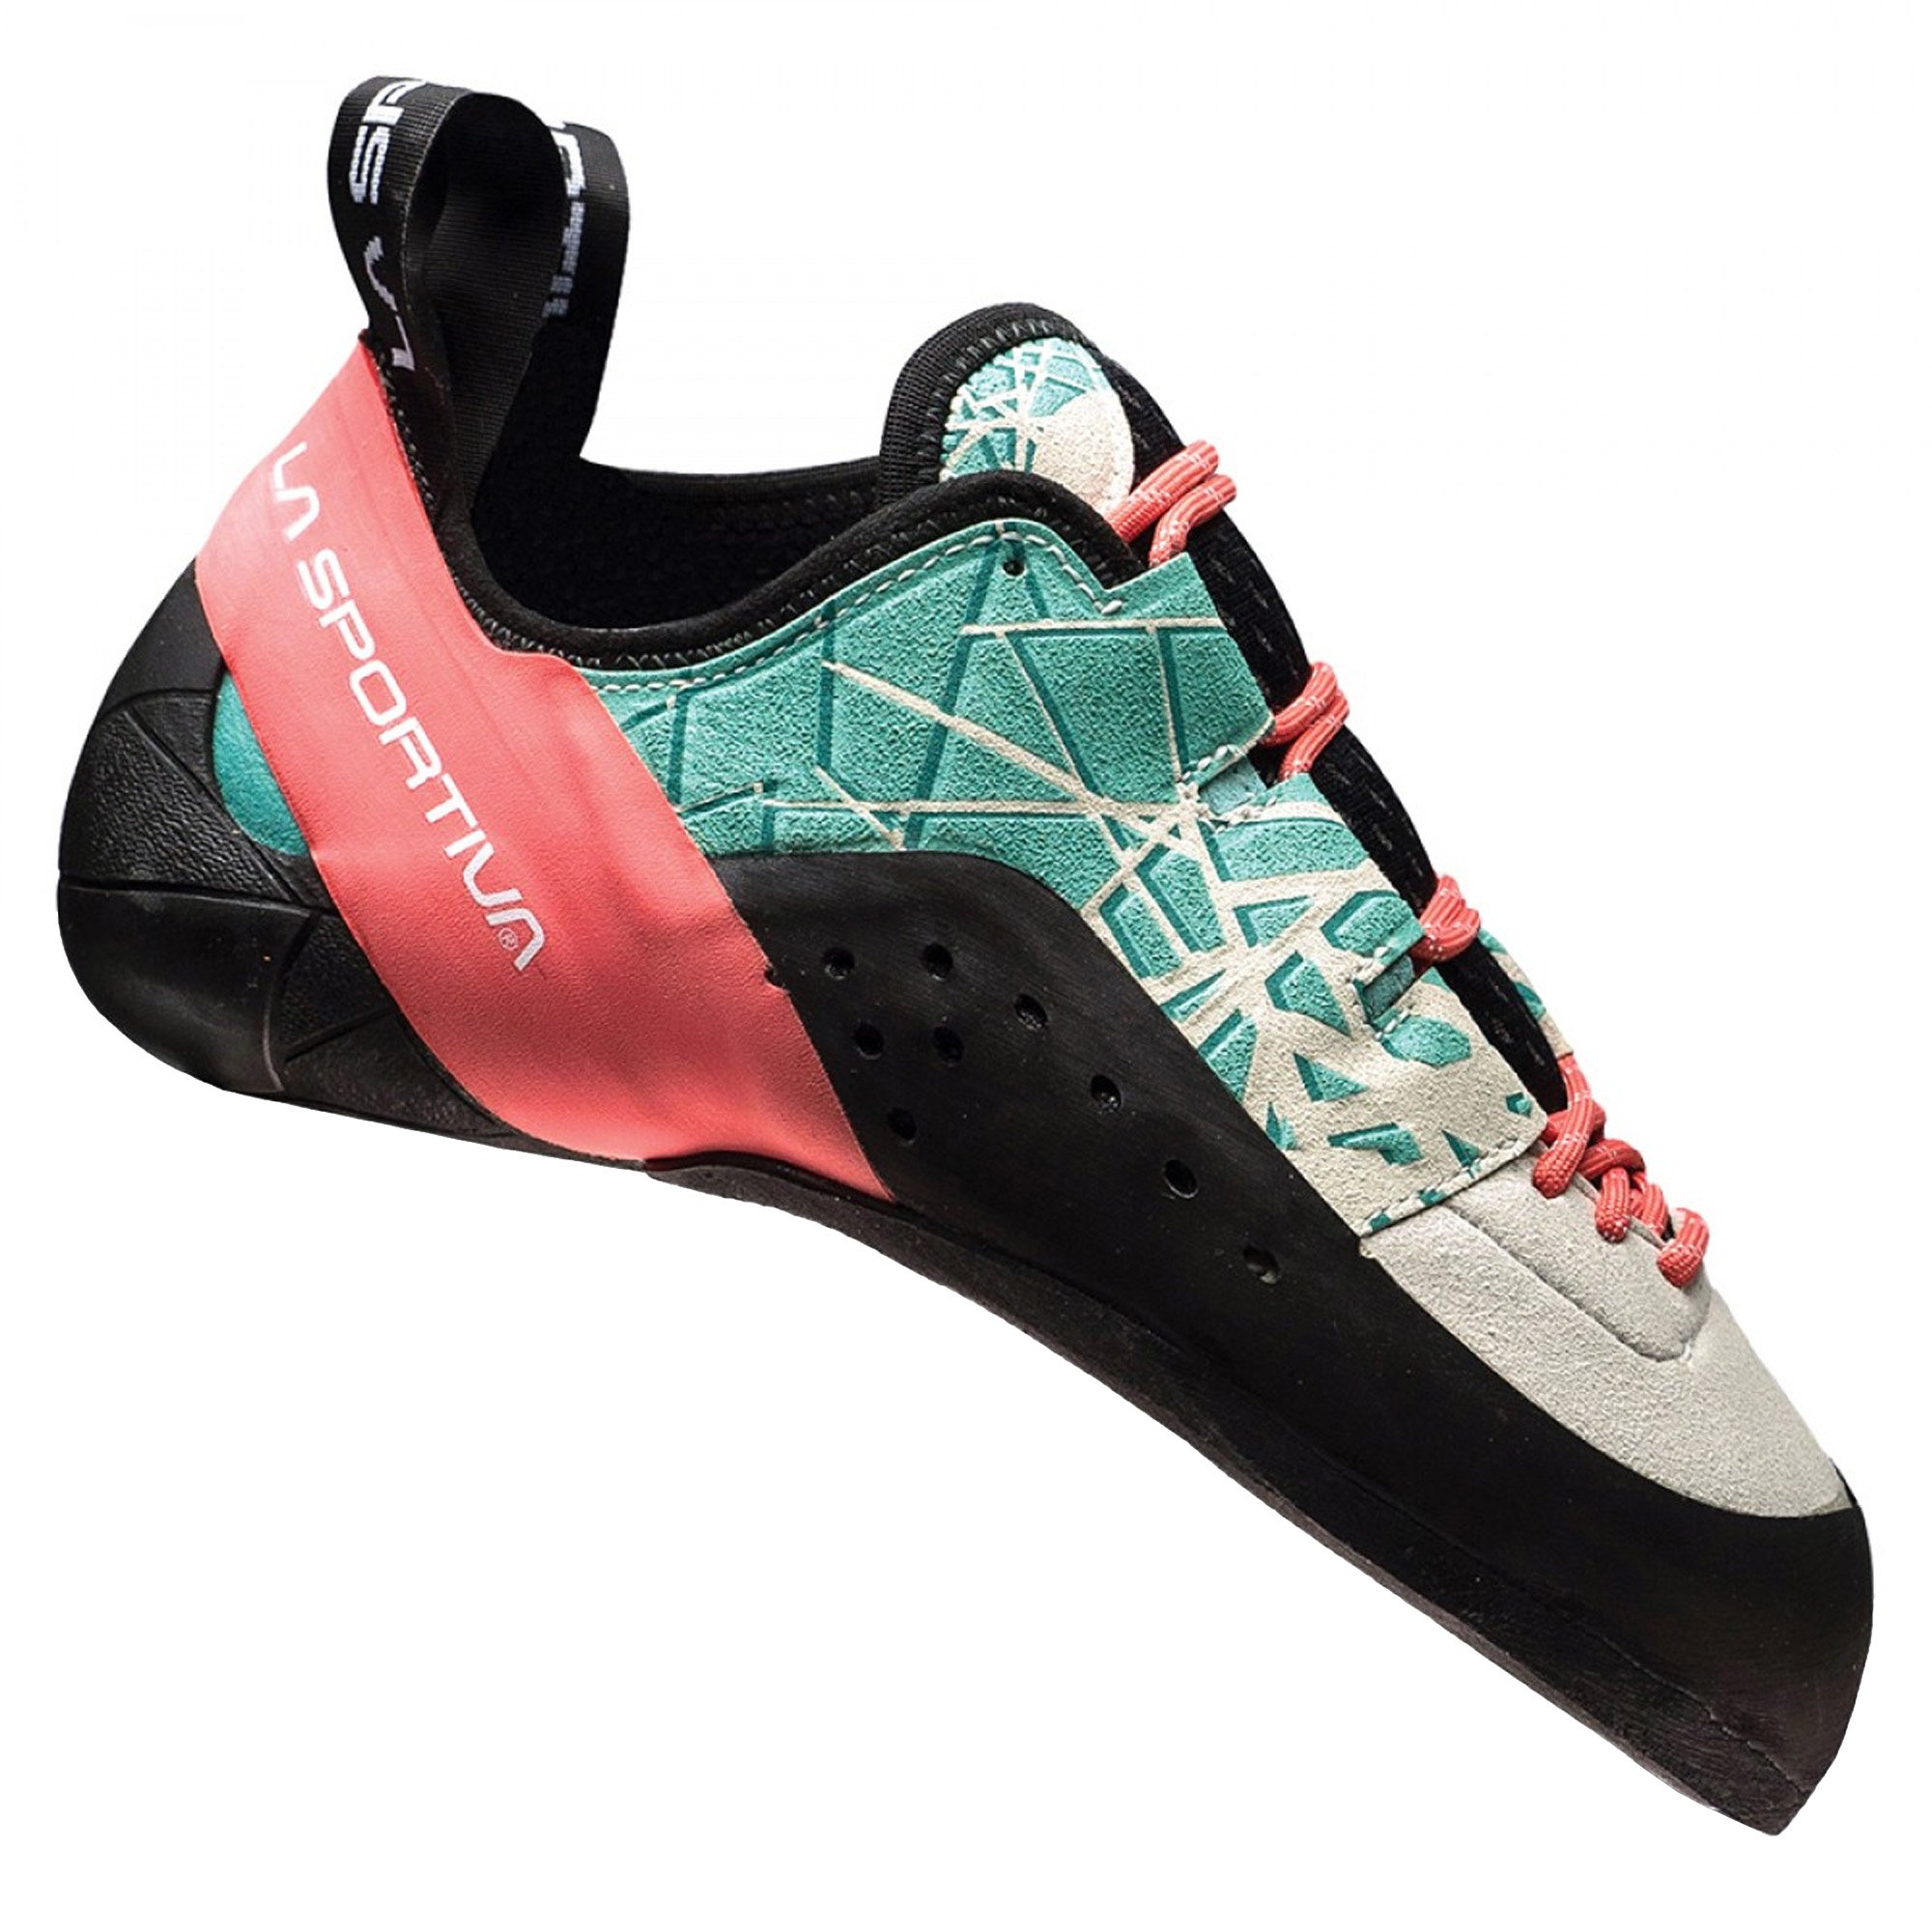 La Sportiva Kataki Climbing Shoe - Women's, Mint/Coral, 35.5 by La Sportiva